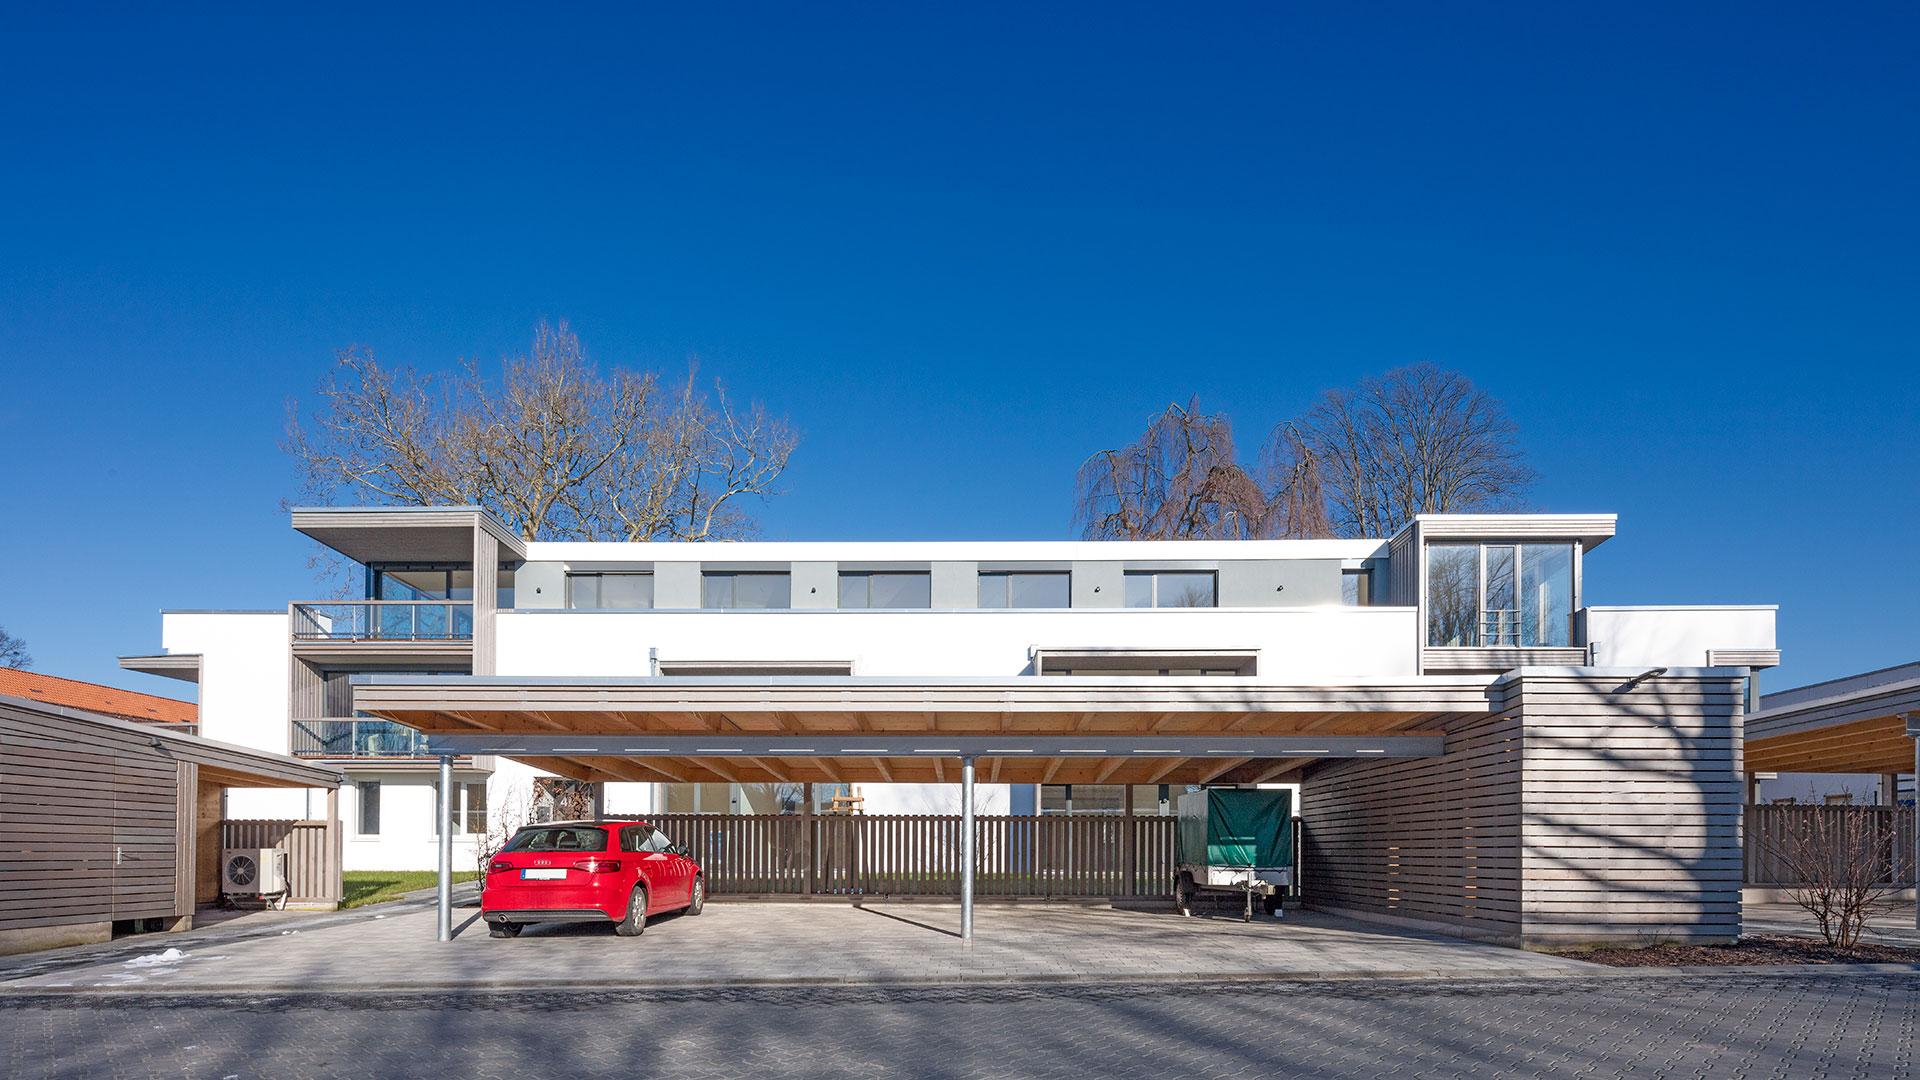 Architekturfotografie: Neubau | Foto: Dieter Eikenberg, imprints